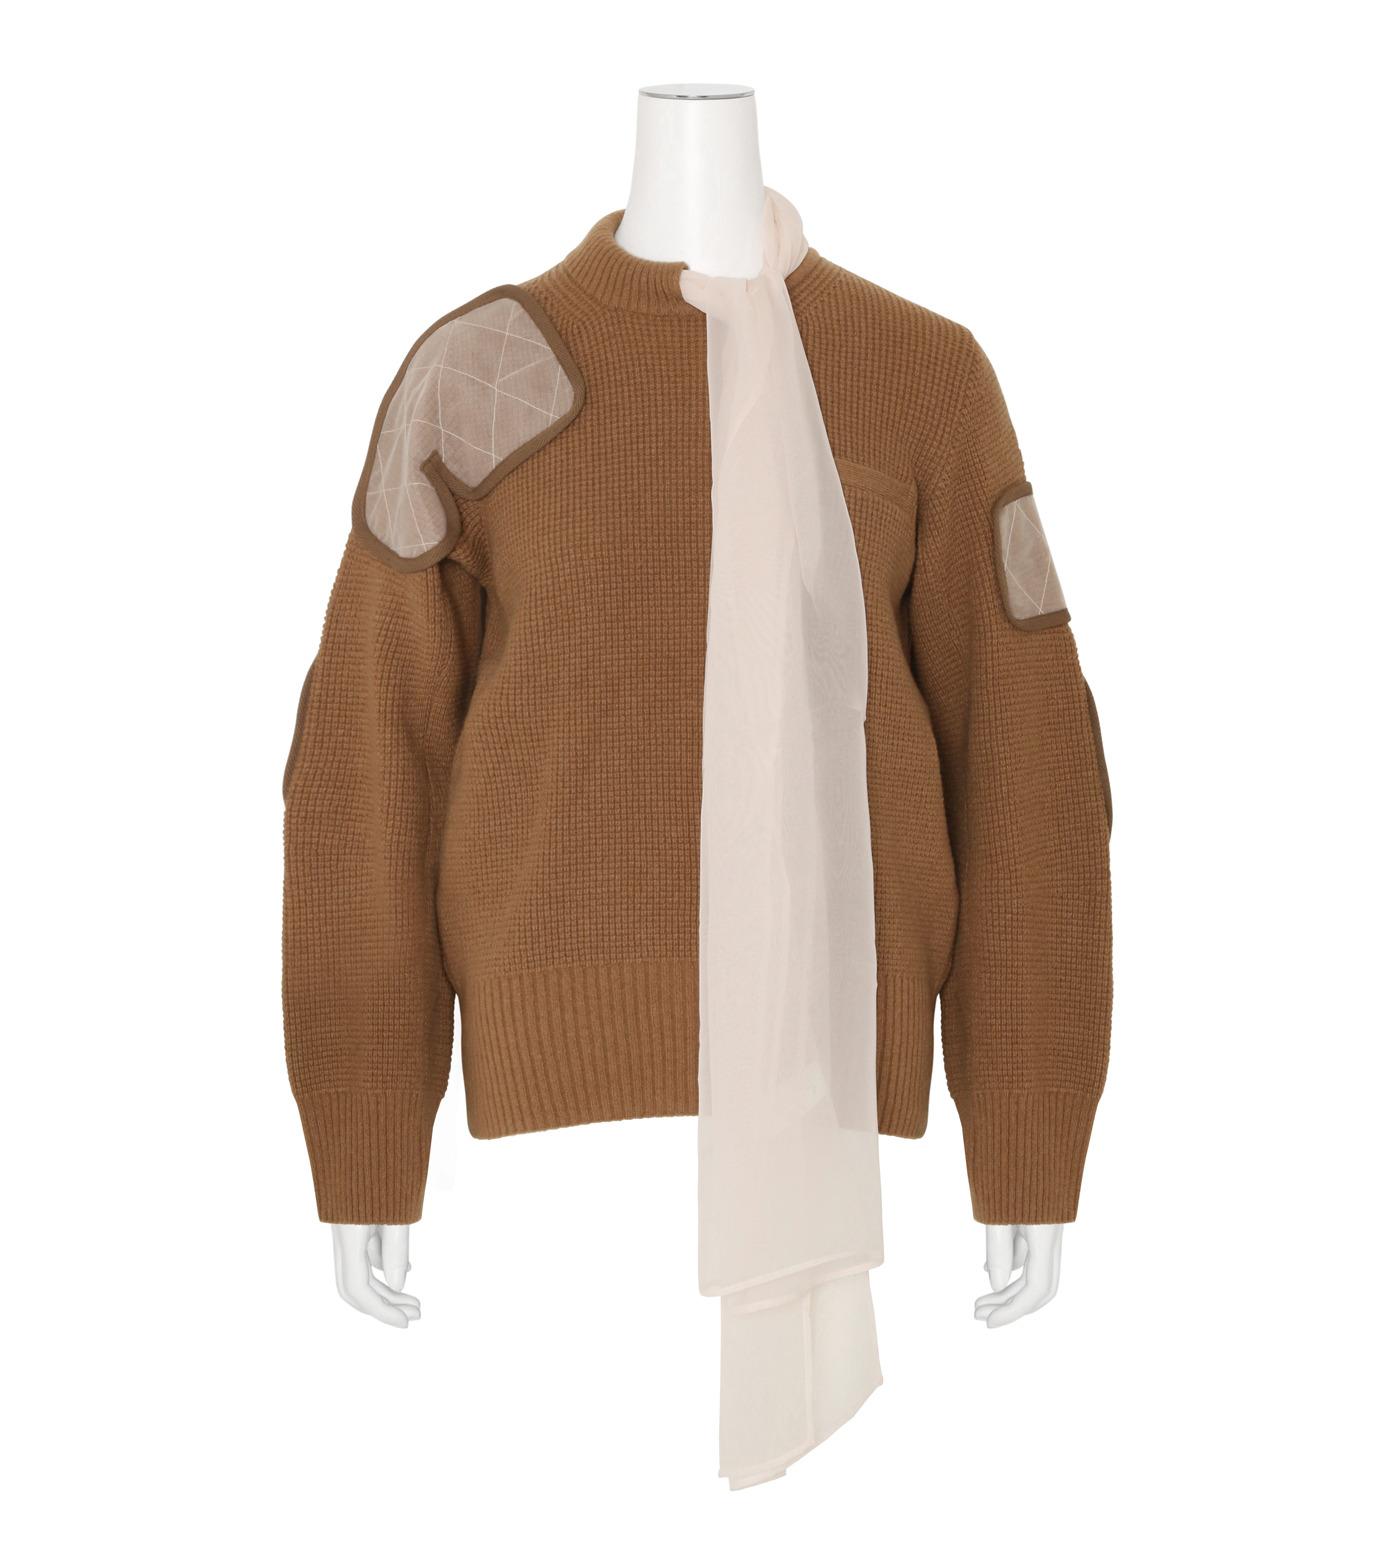 Sacai(サカイ)のLS Military Sweater w/Chiffon Scarf-CAMEL(ニット/knit)-16-02855-53 拡大詳細画像1